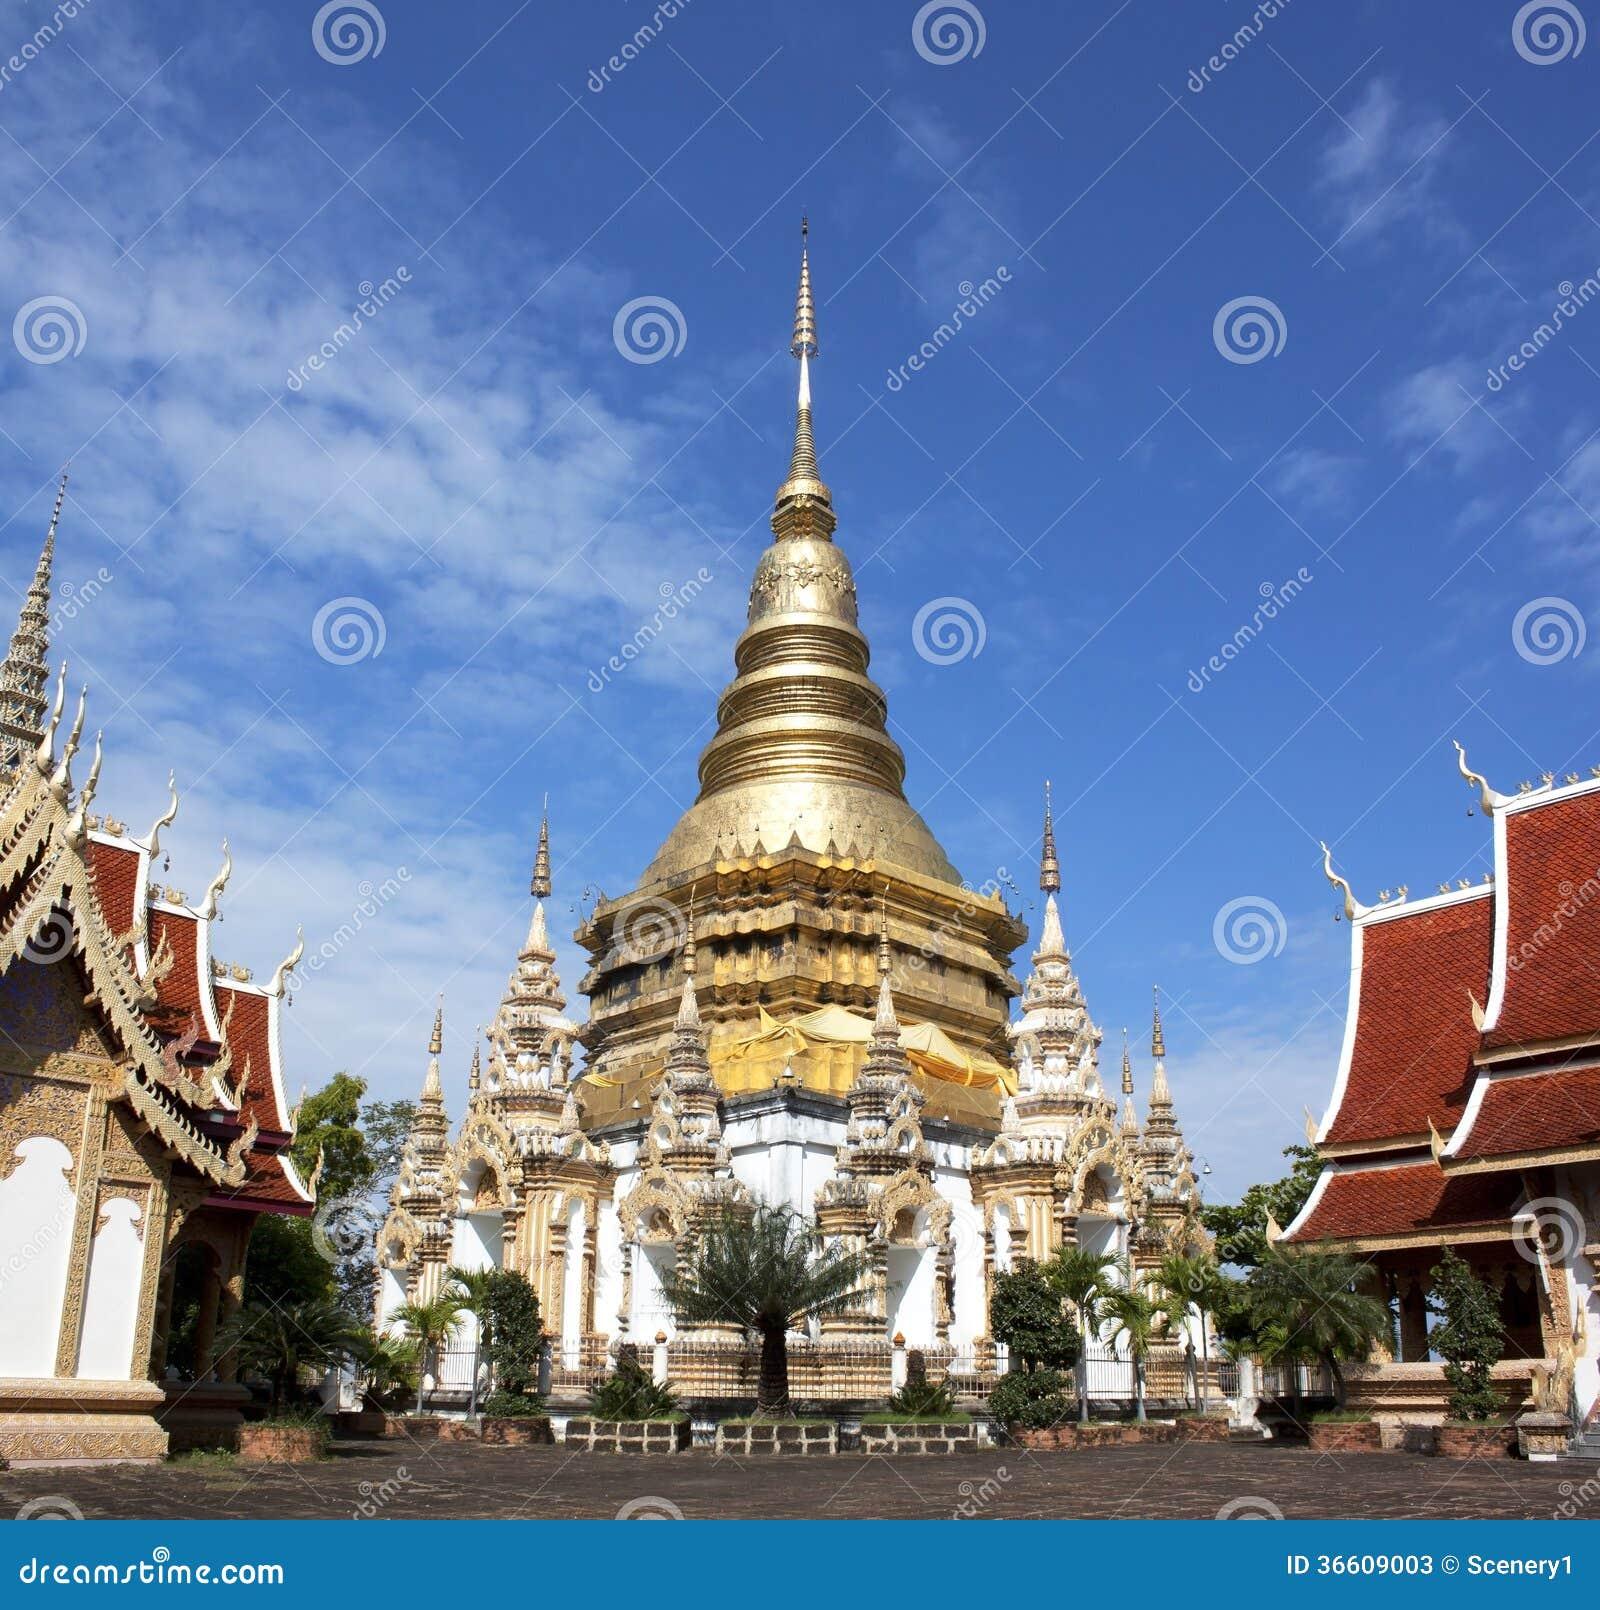 Buddhism Place Of Worship - Beautiful Place 2017